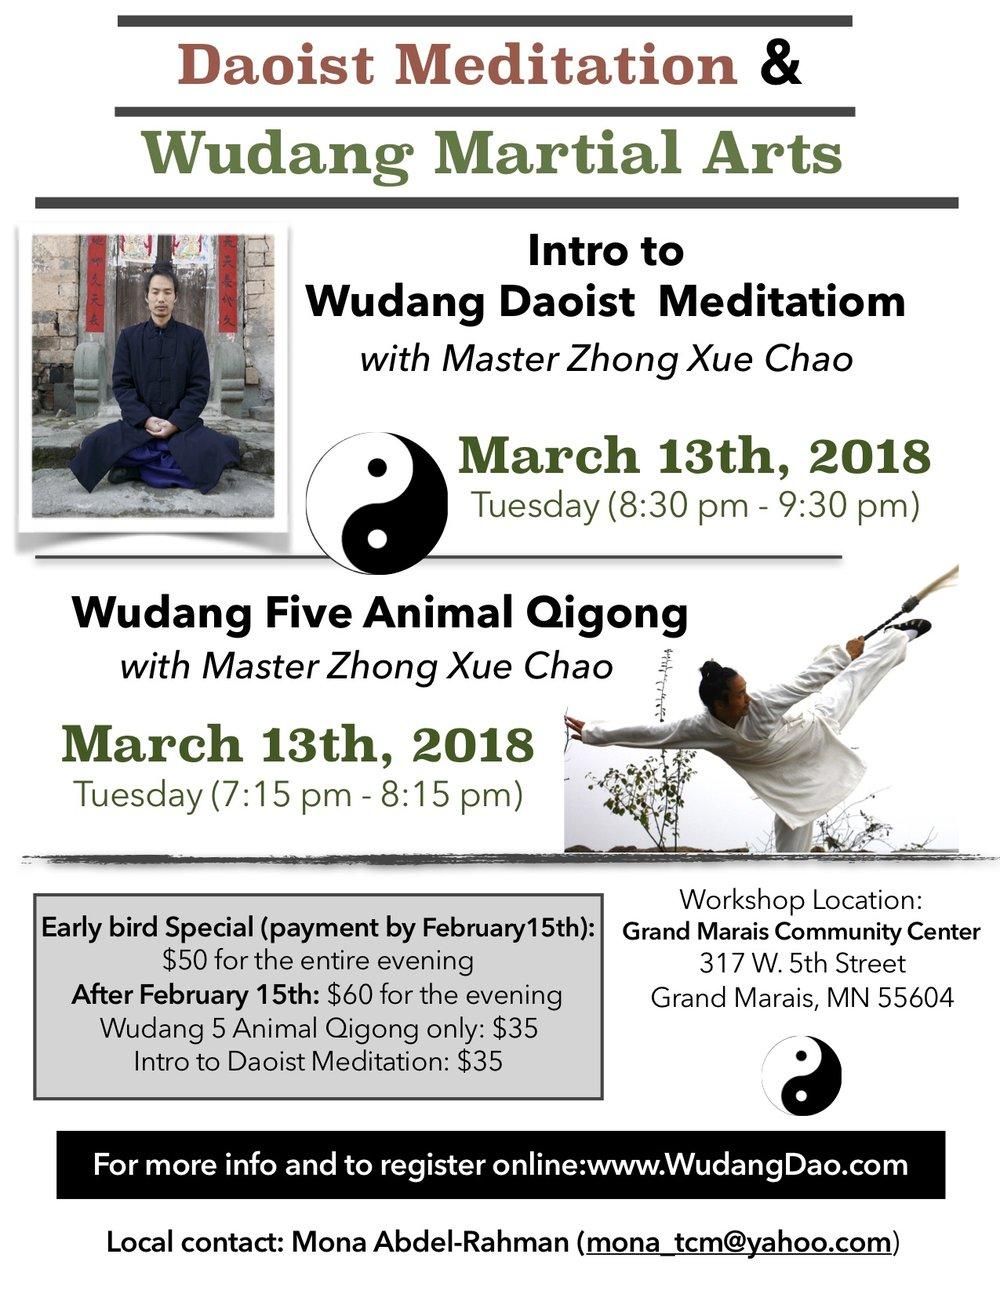 Wudang daoist meditation